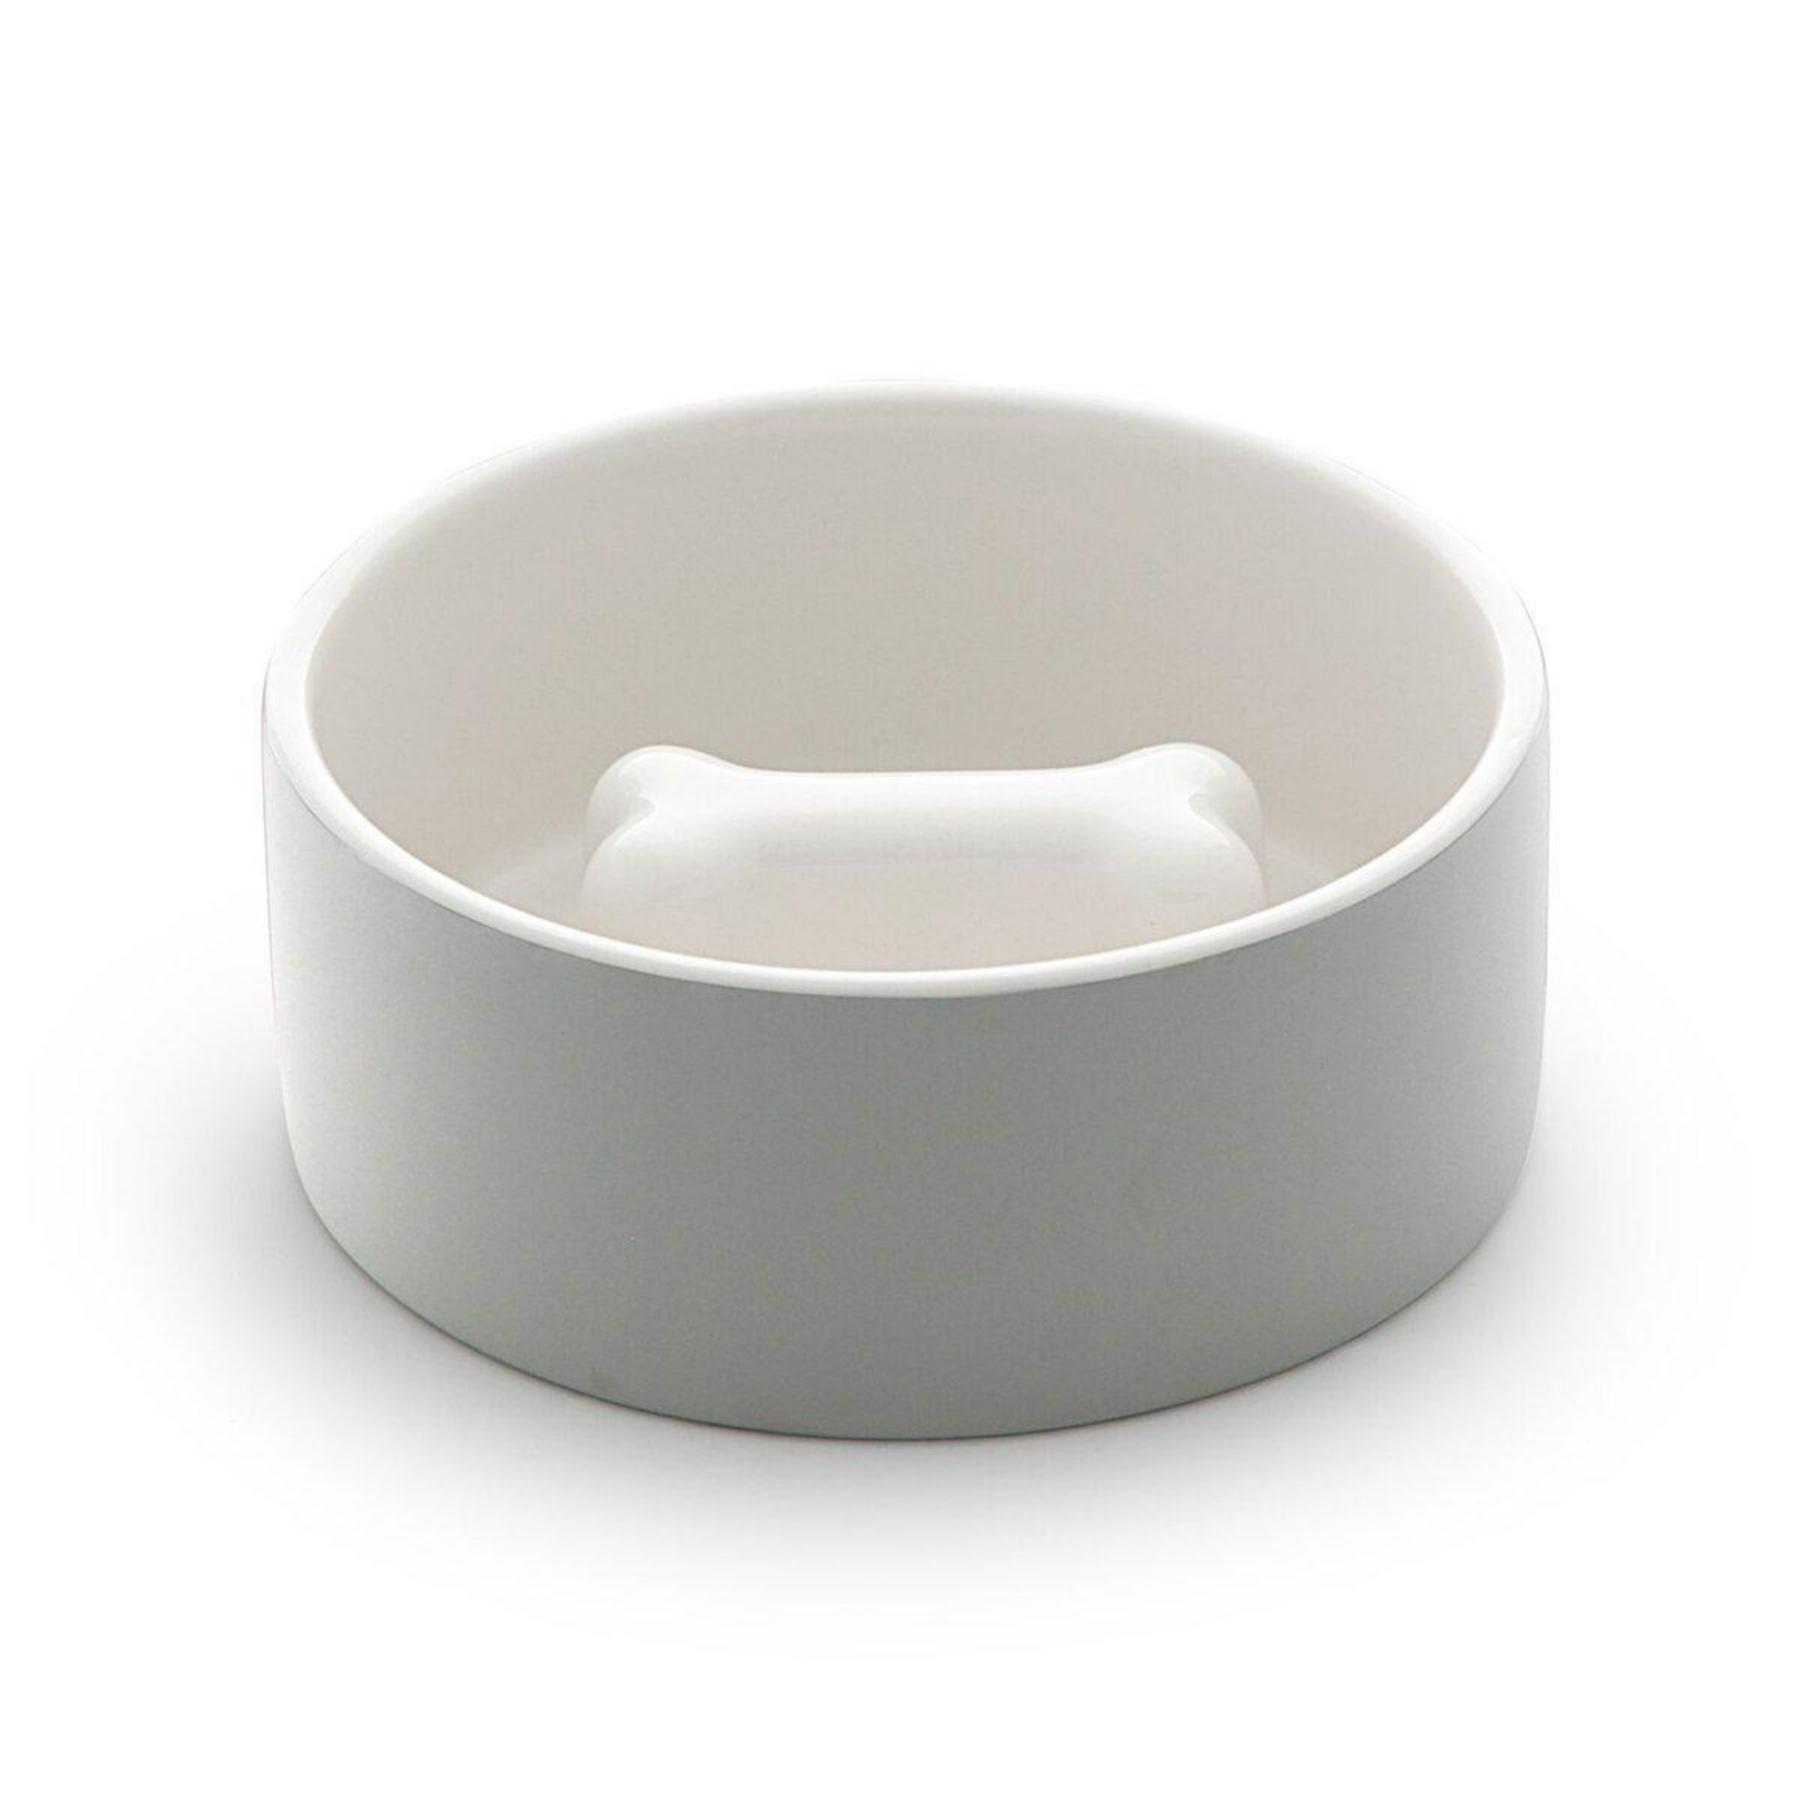 Happy Pet Project dog bowls